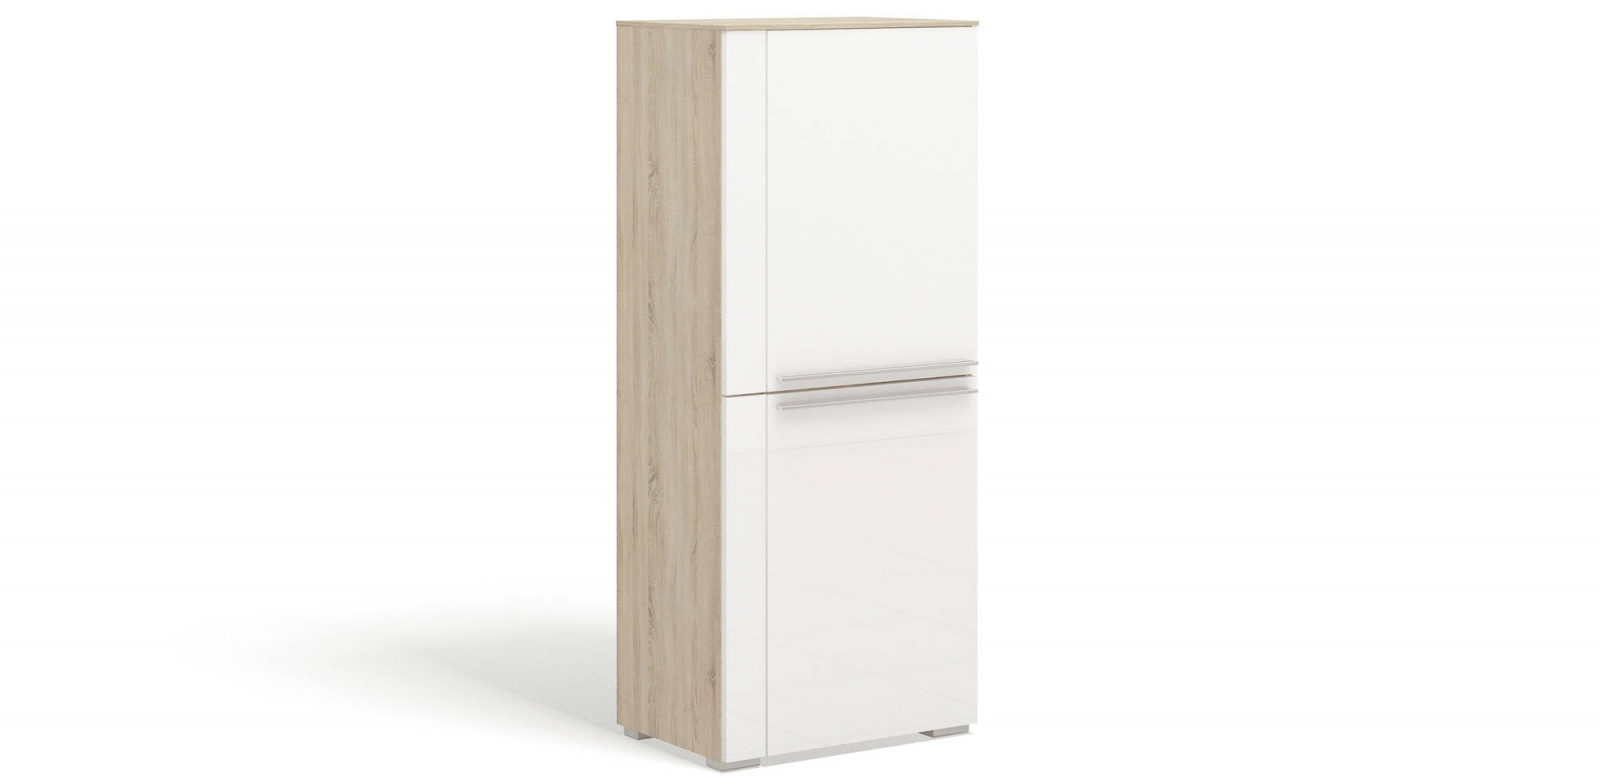 SOLO Белый глянец 391.41-DB Шкаф - 1